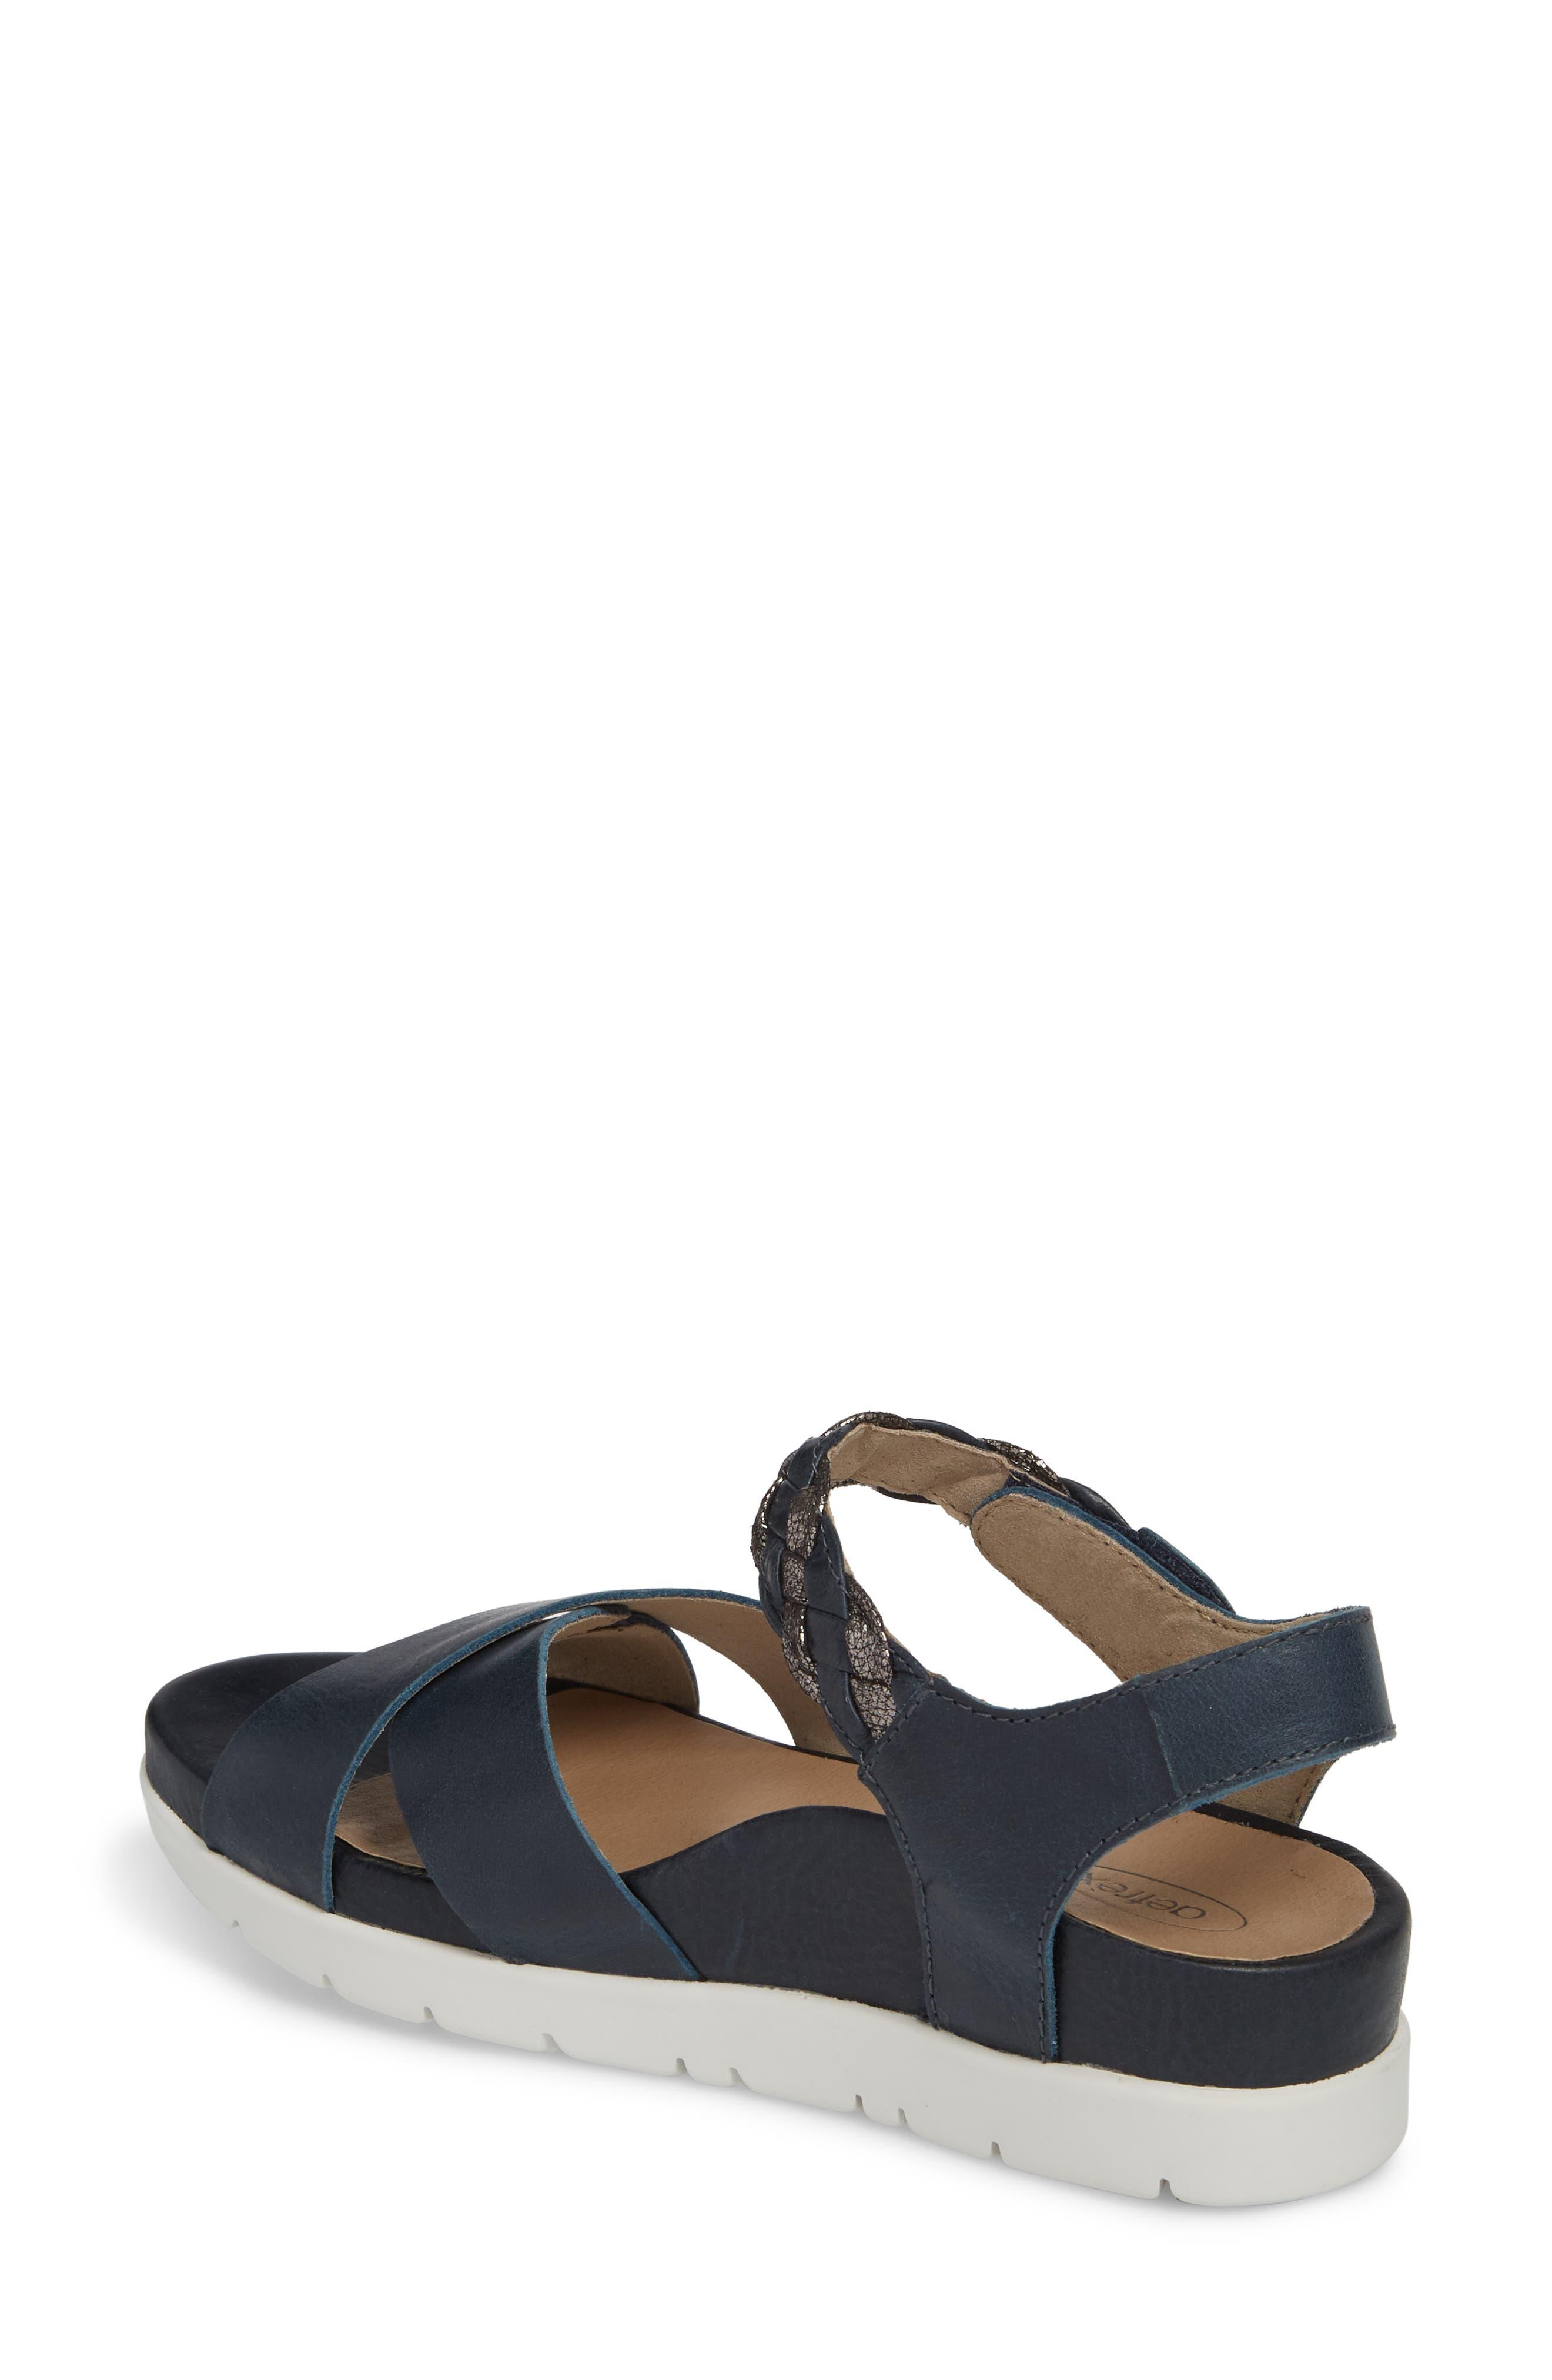 Piper Sandal,                             Alternate thumbnail 2, color,                             Navy Leather